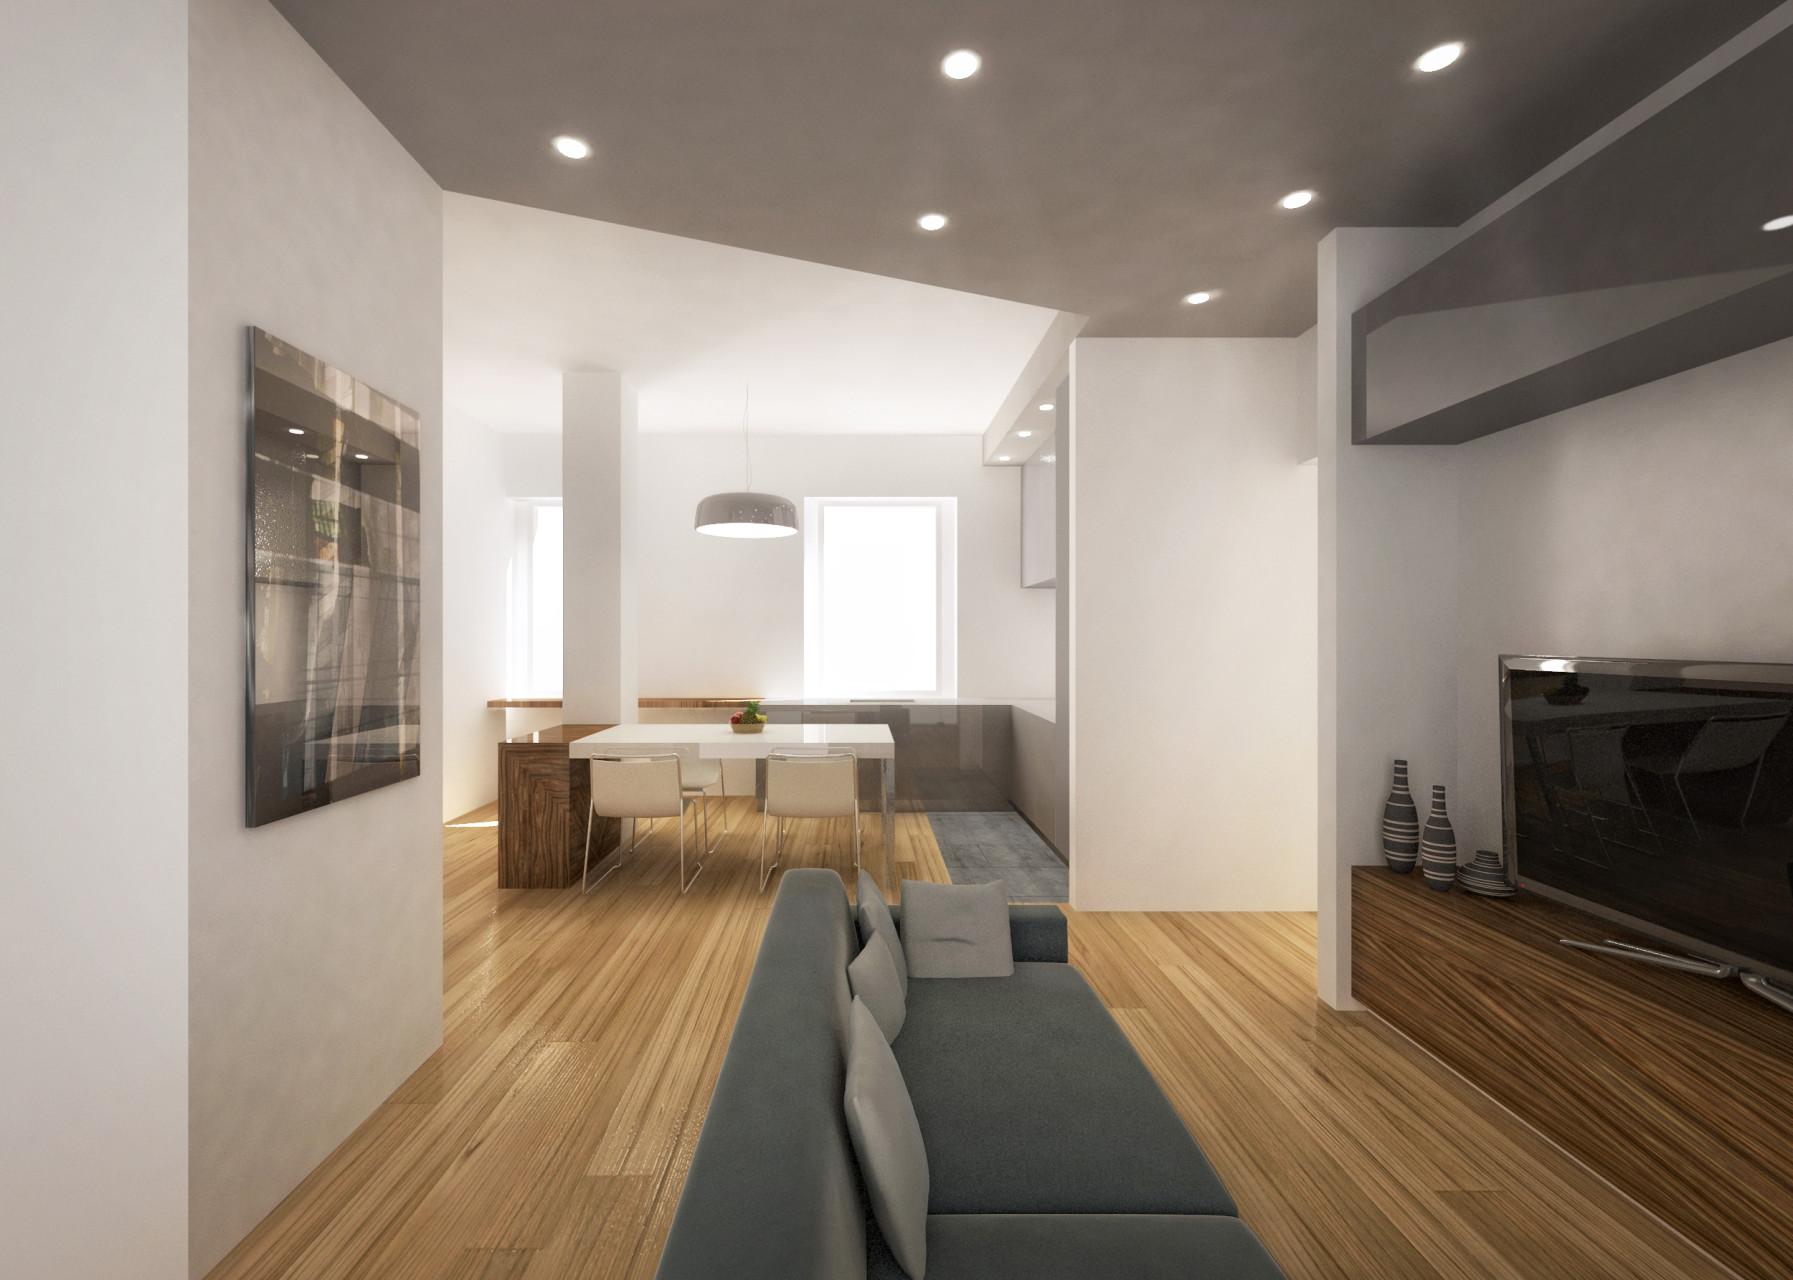 Wisp-Architects-Apartment-Milan 1